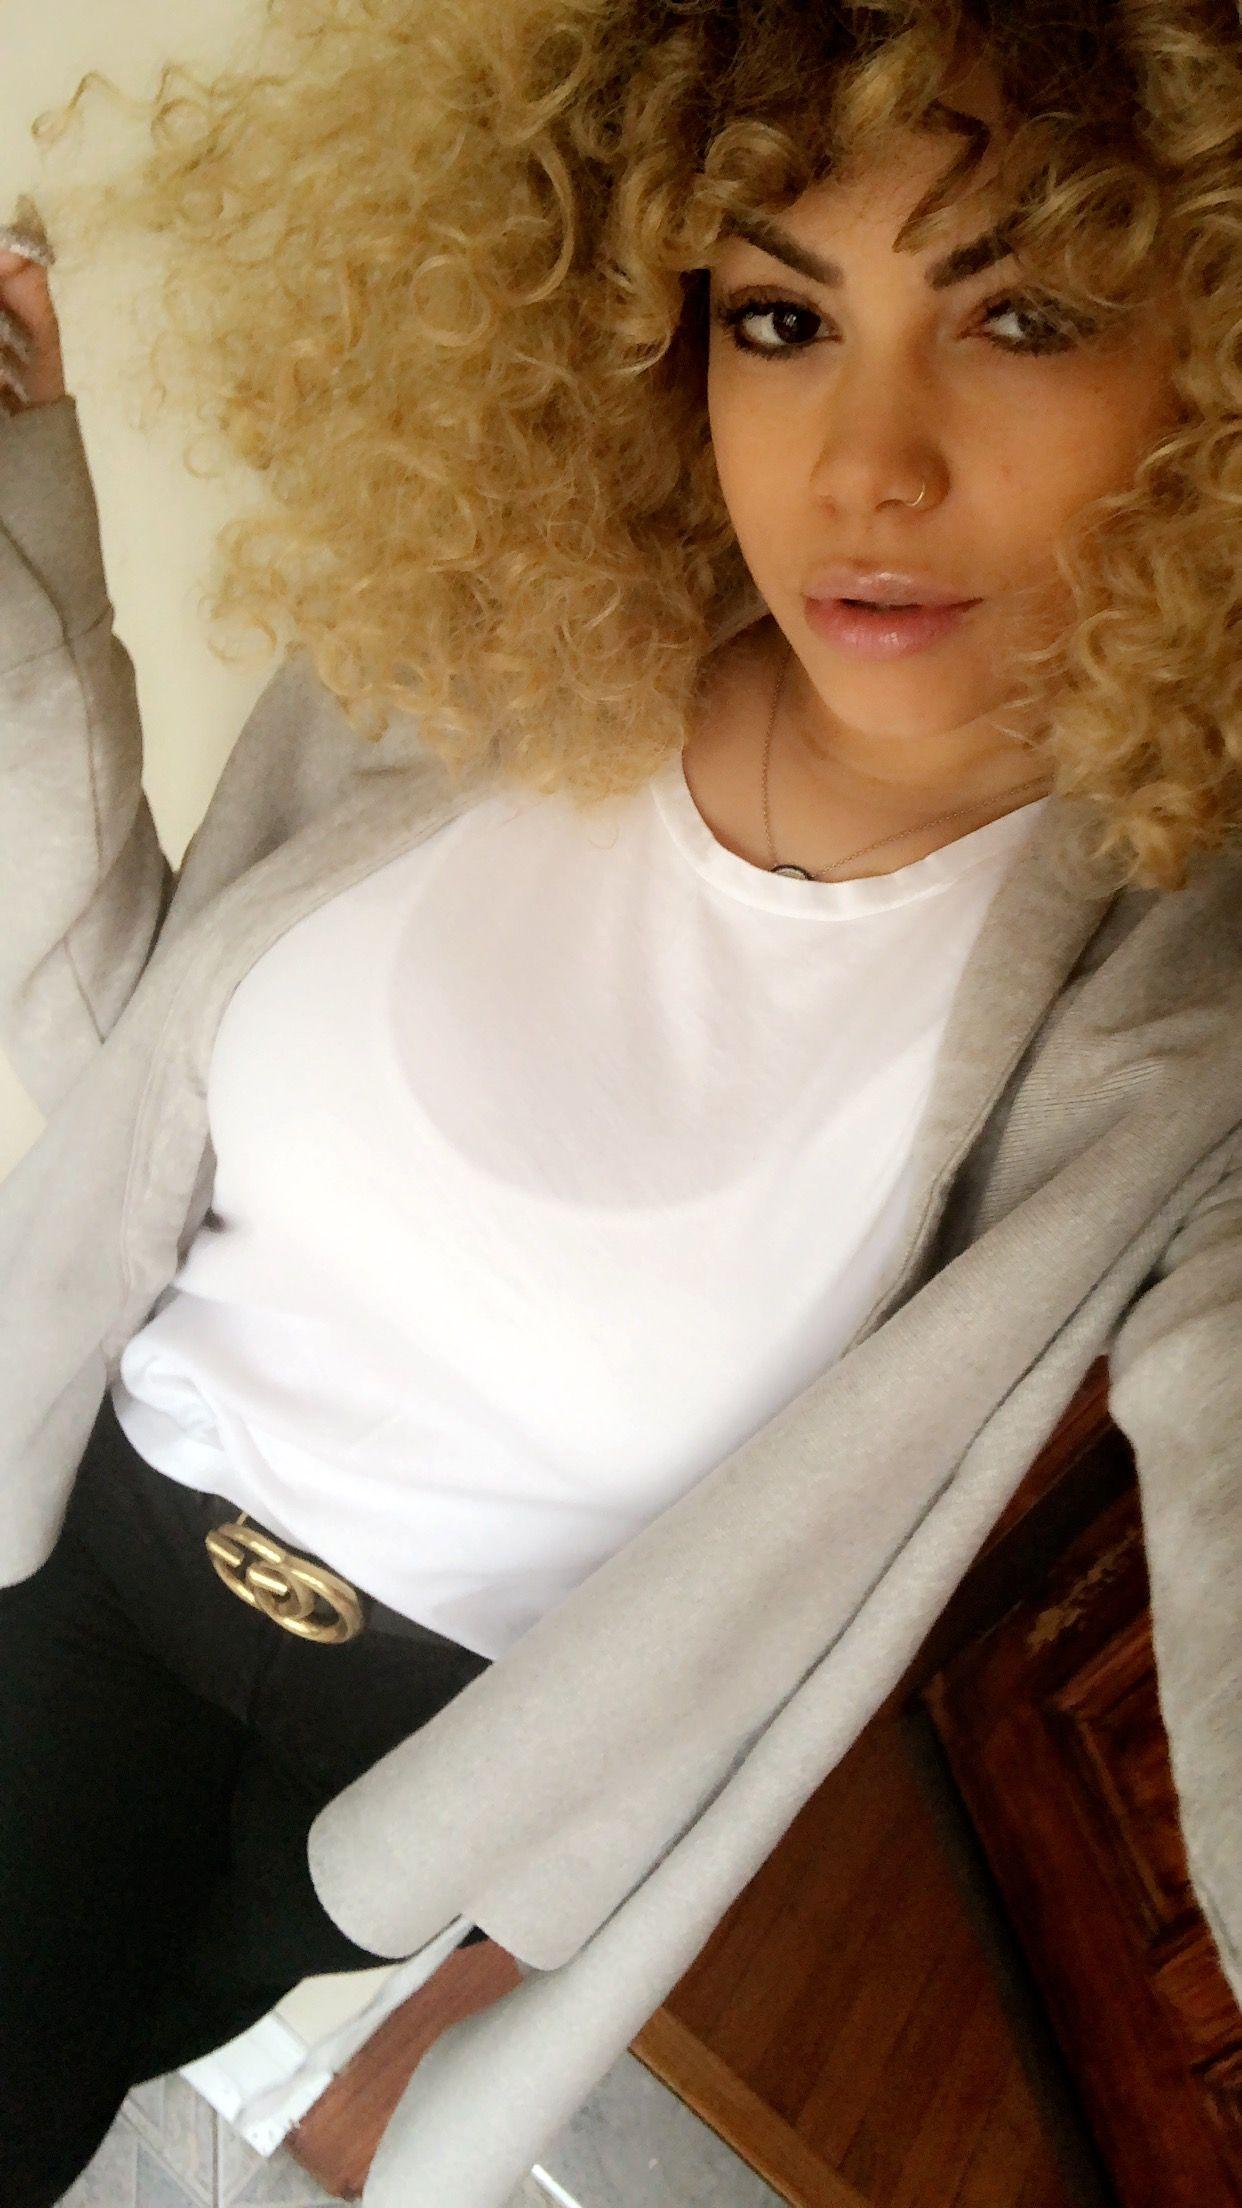 Blonde curly hair beautybyeli curls curlyhair curlyblondehair